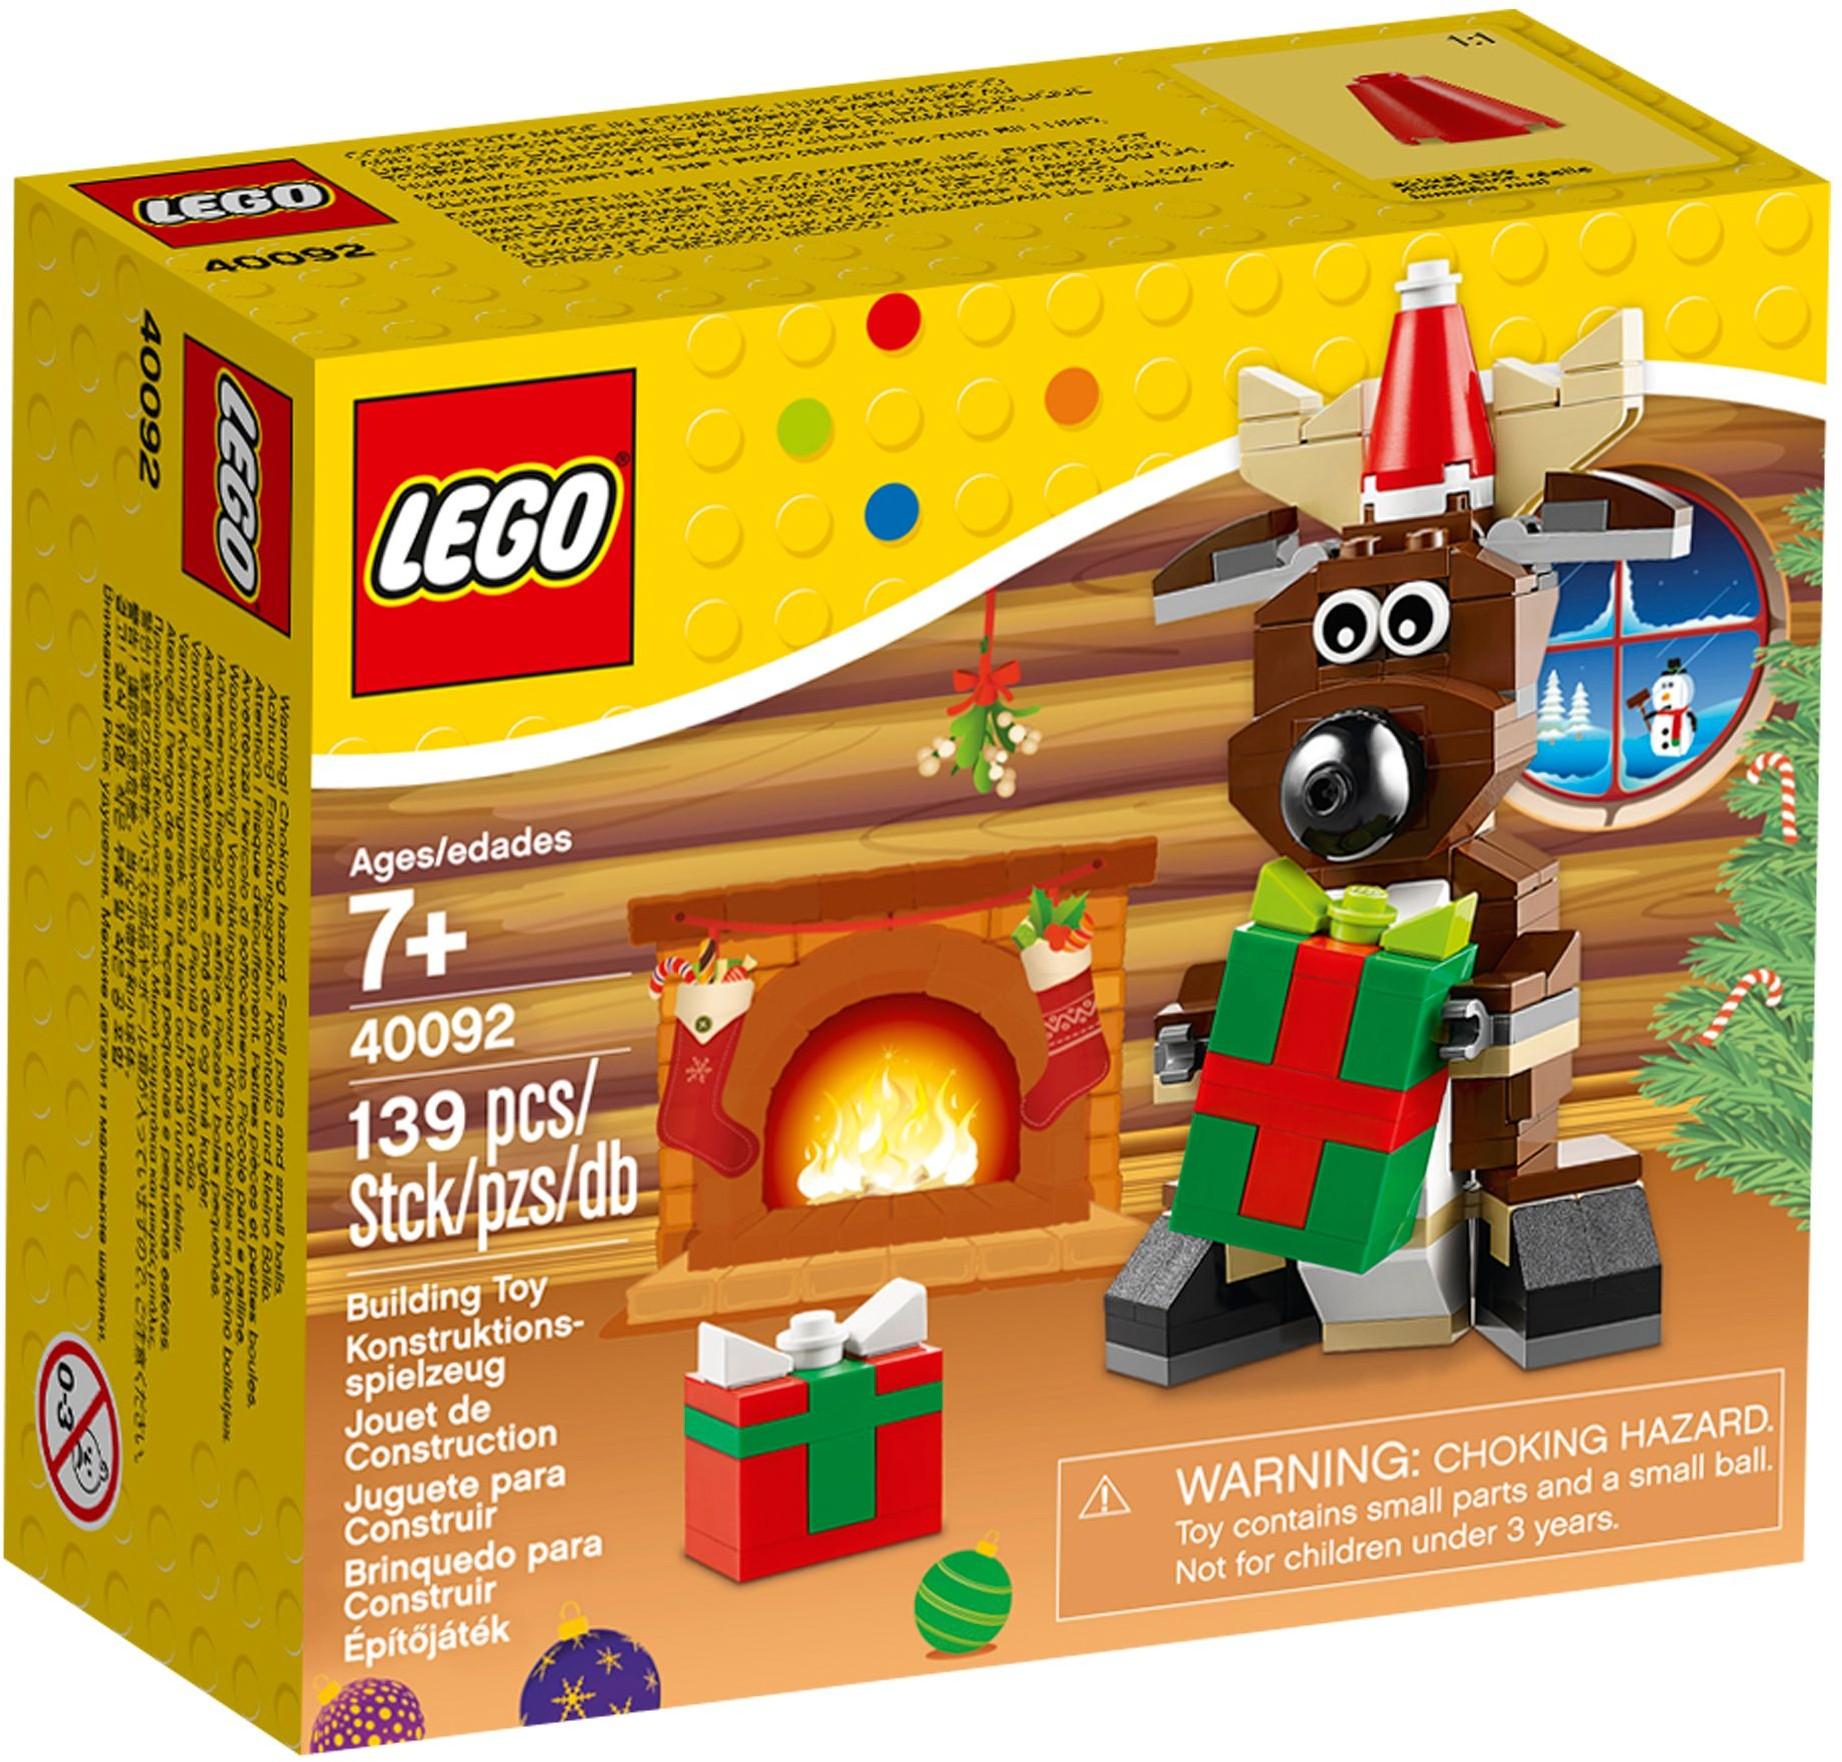 LEGO Reindeer 40092